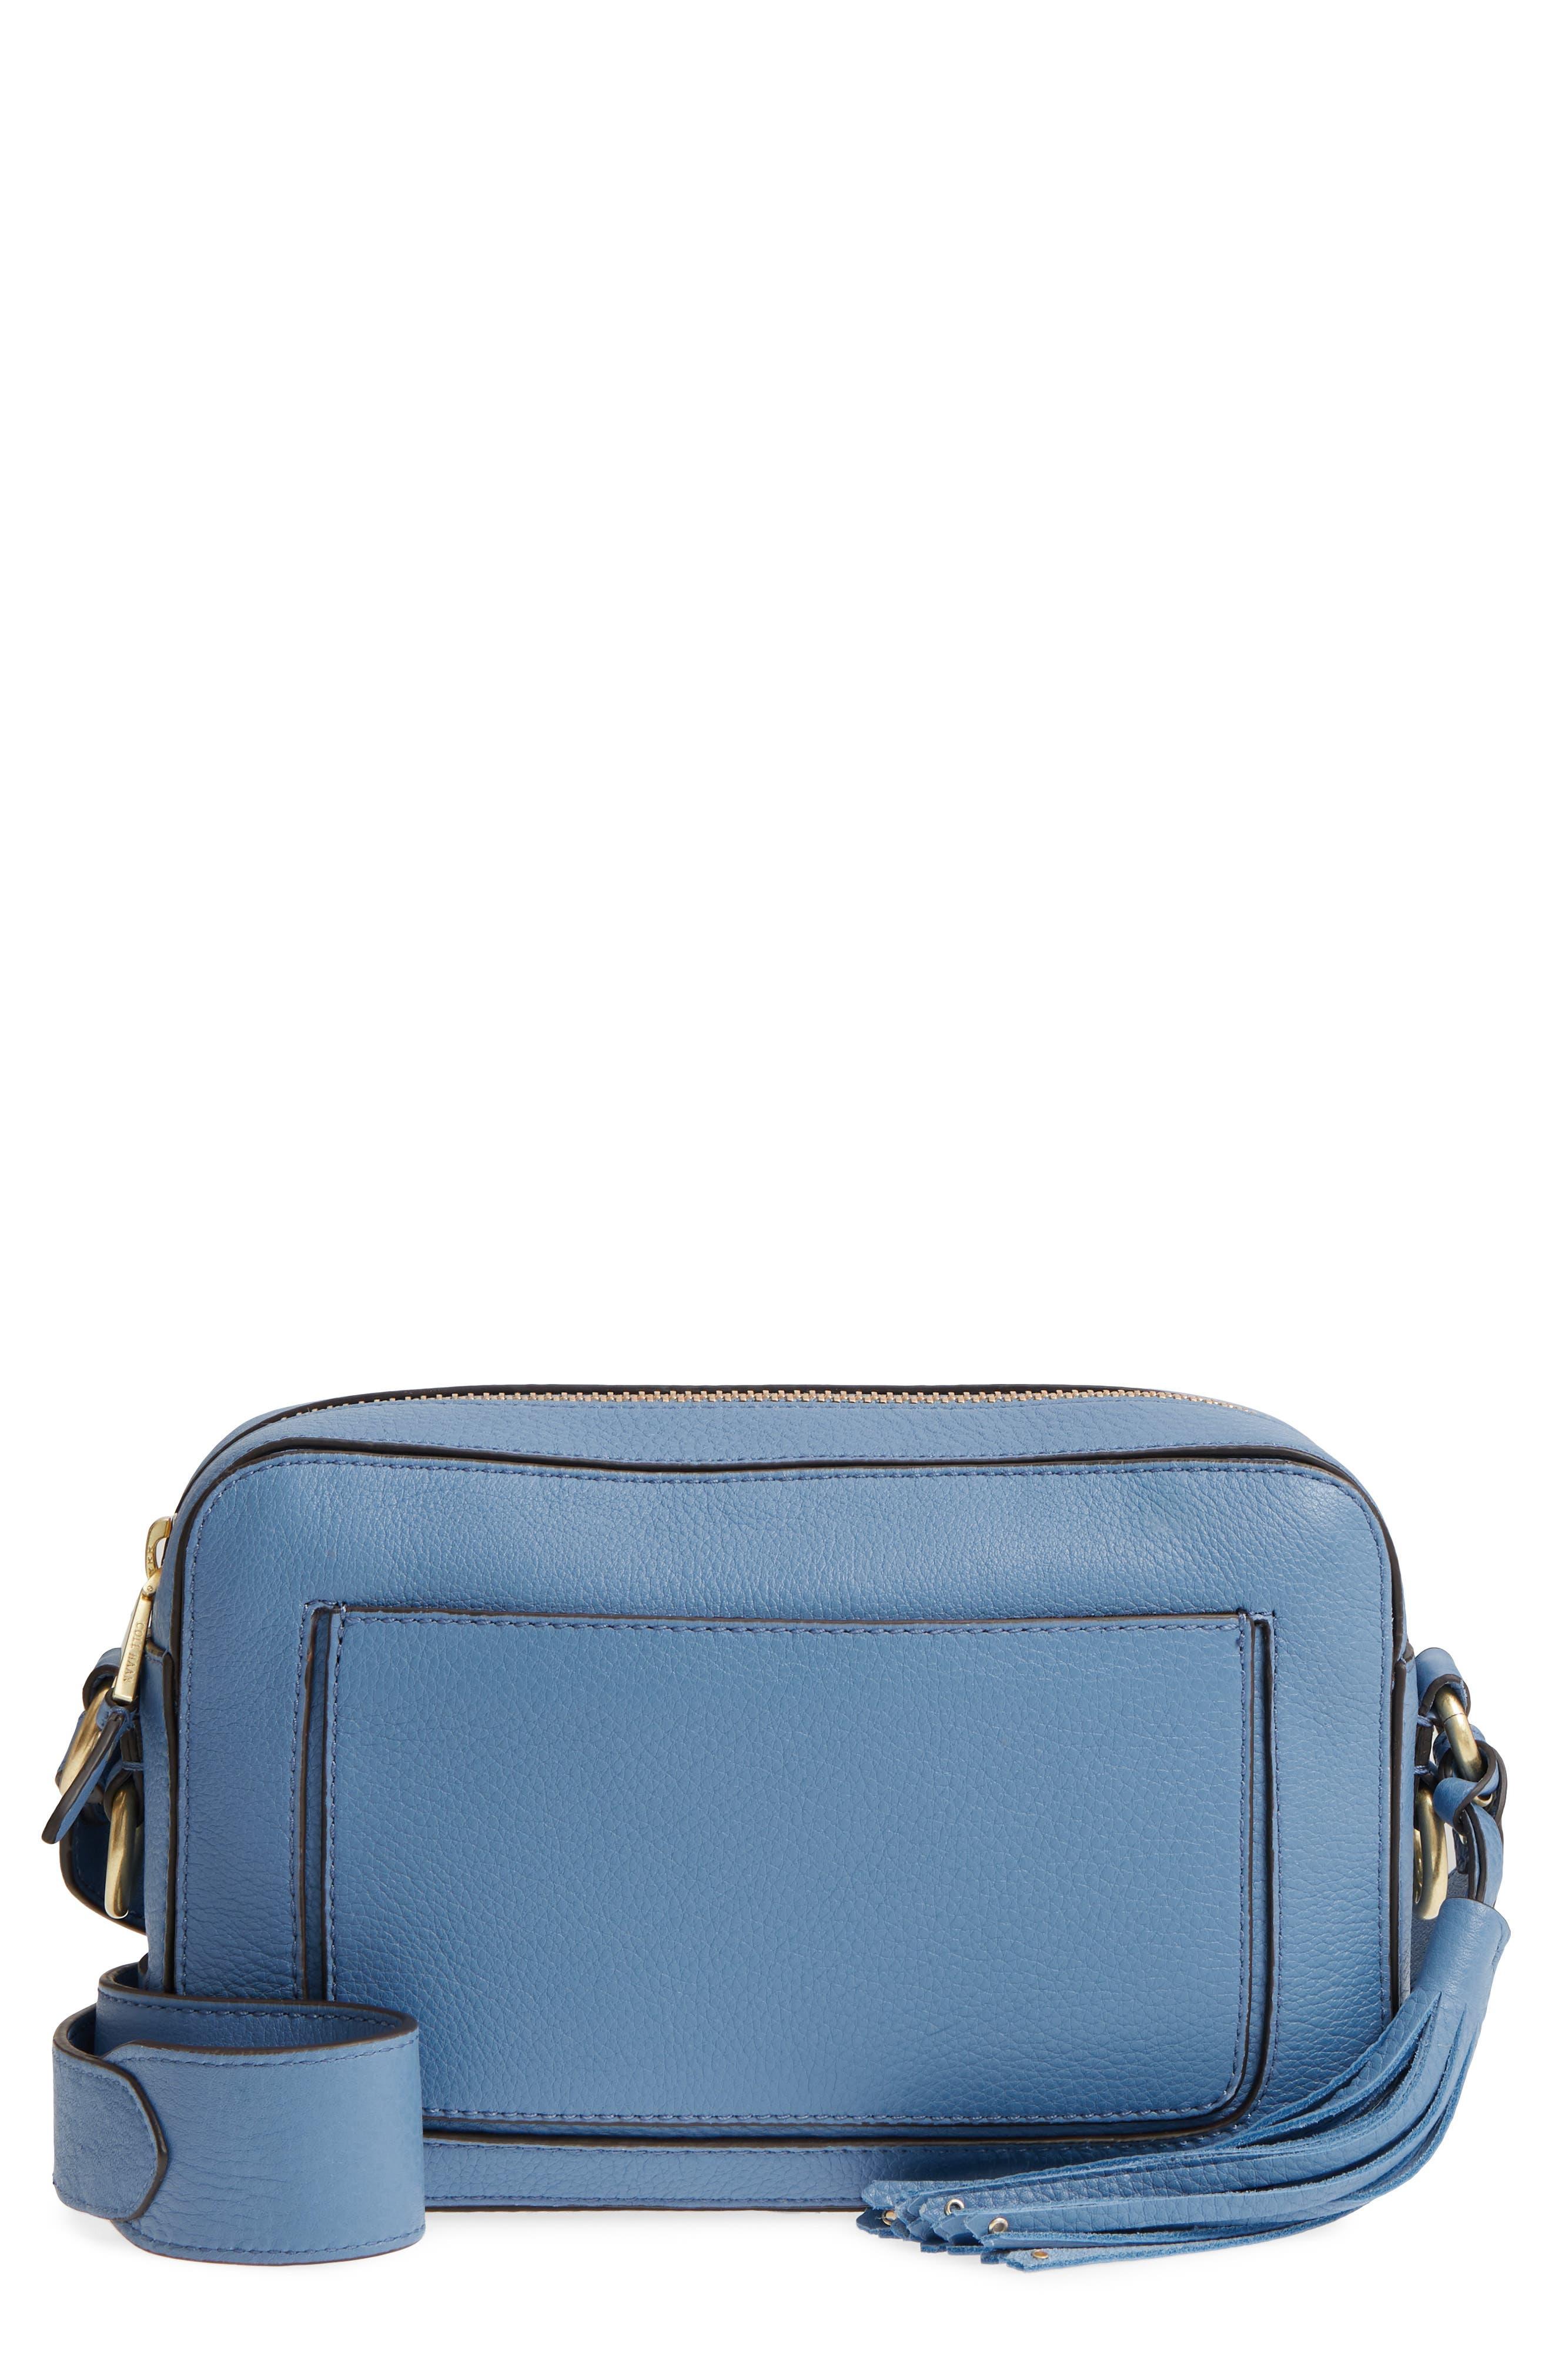 Cassidy RFID Pebbled Leather Camera Bag,                         Main,                         color, Riverside